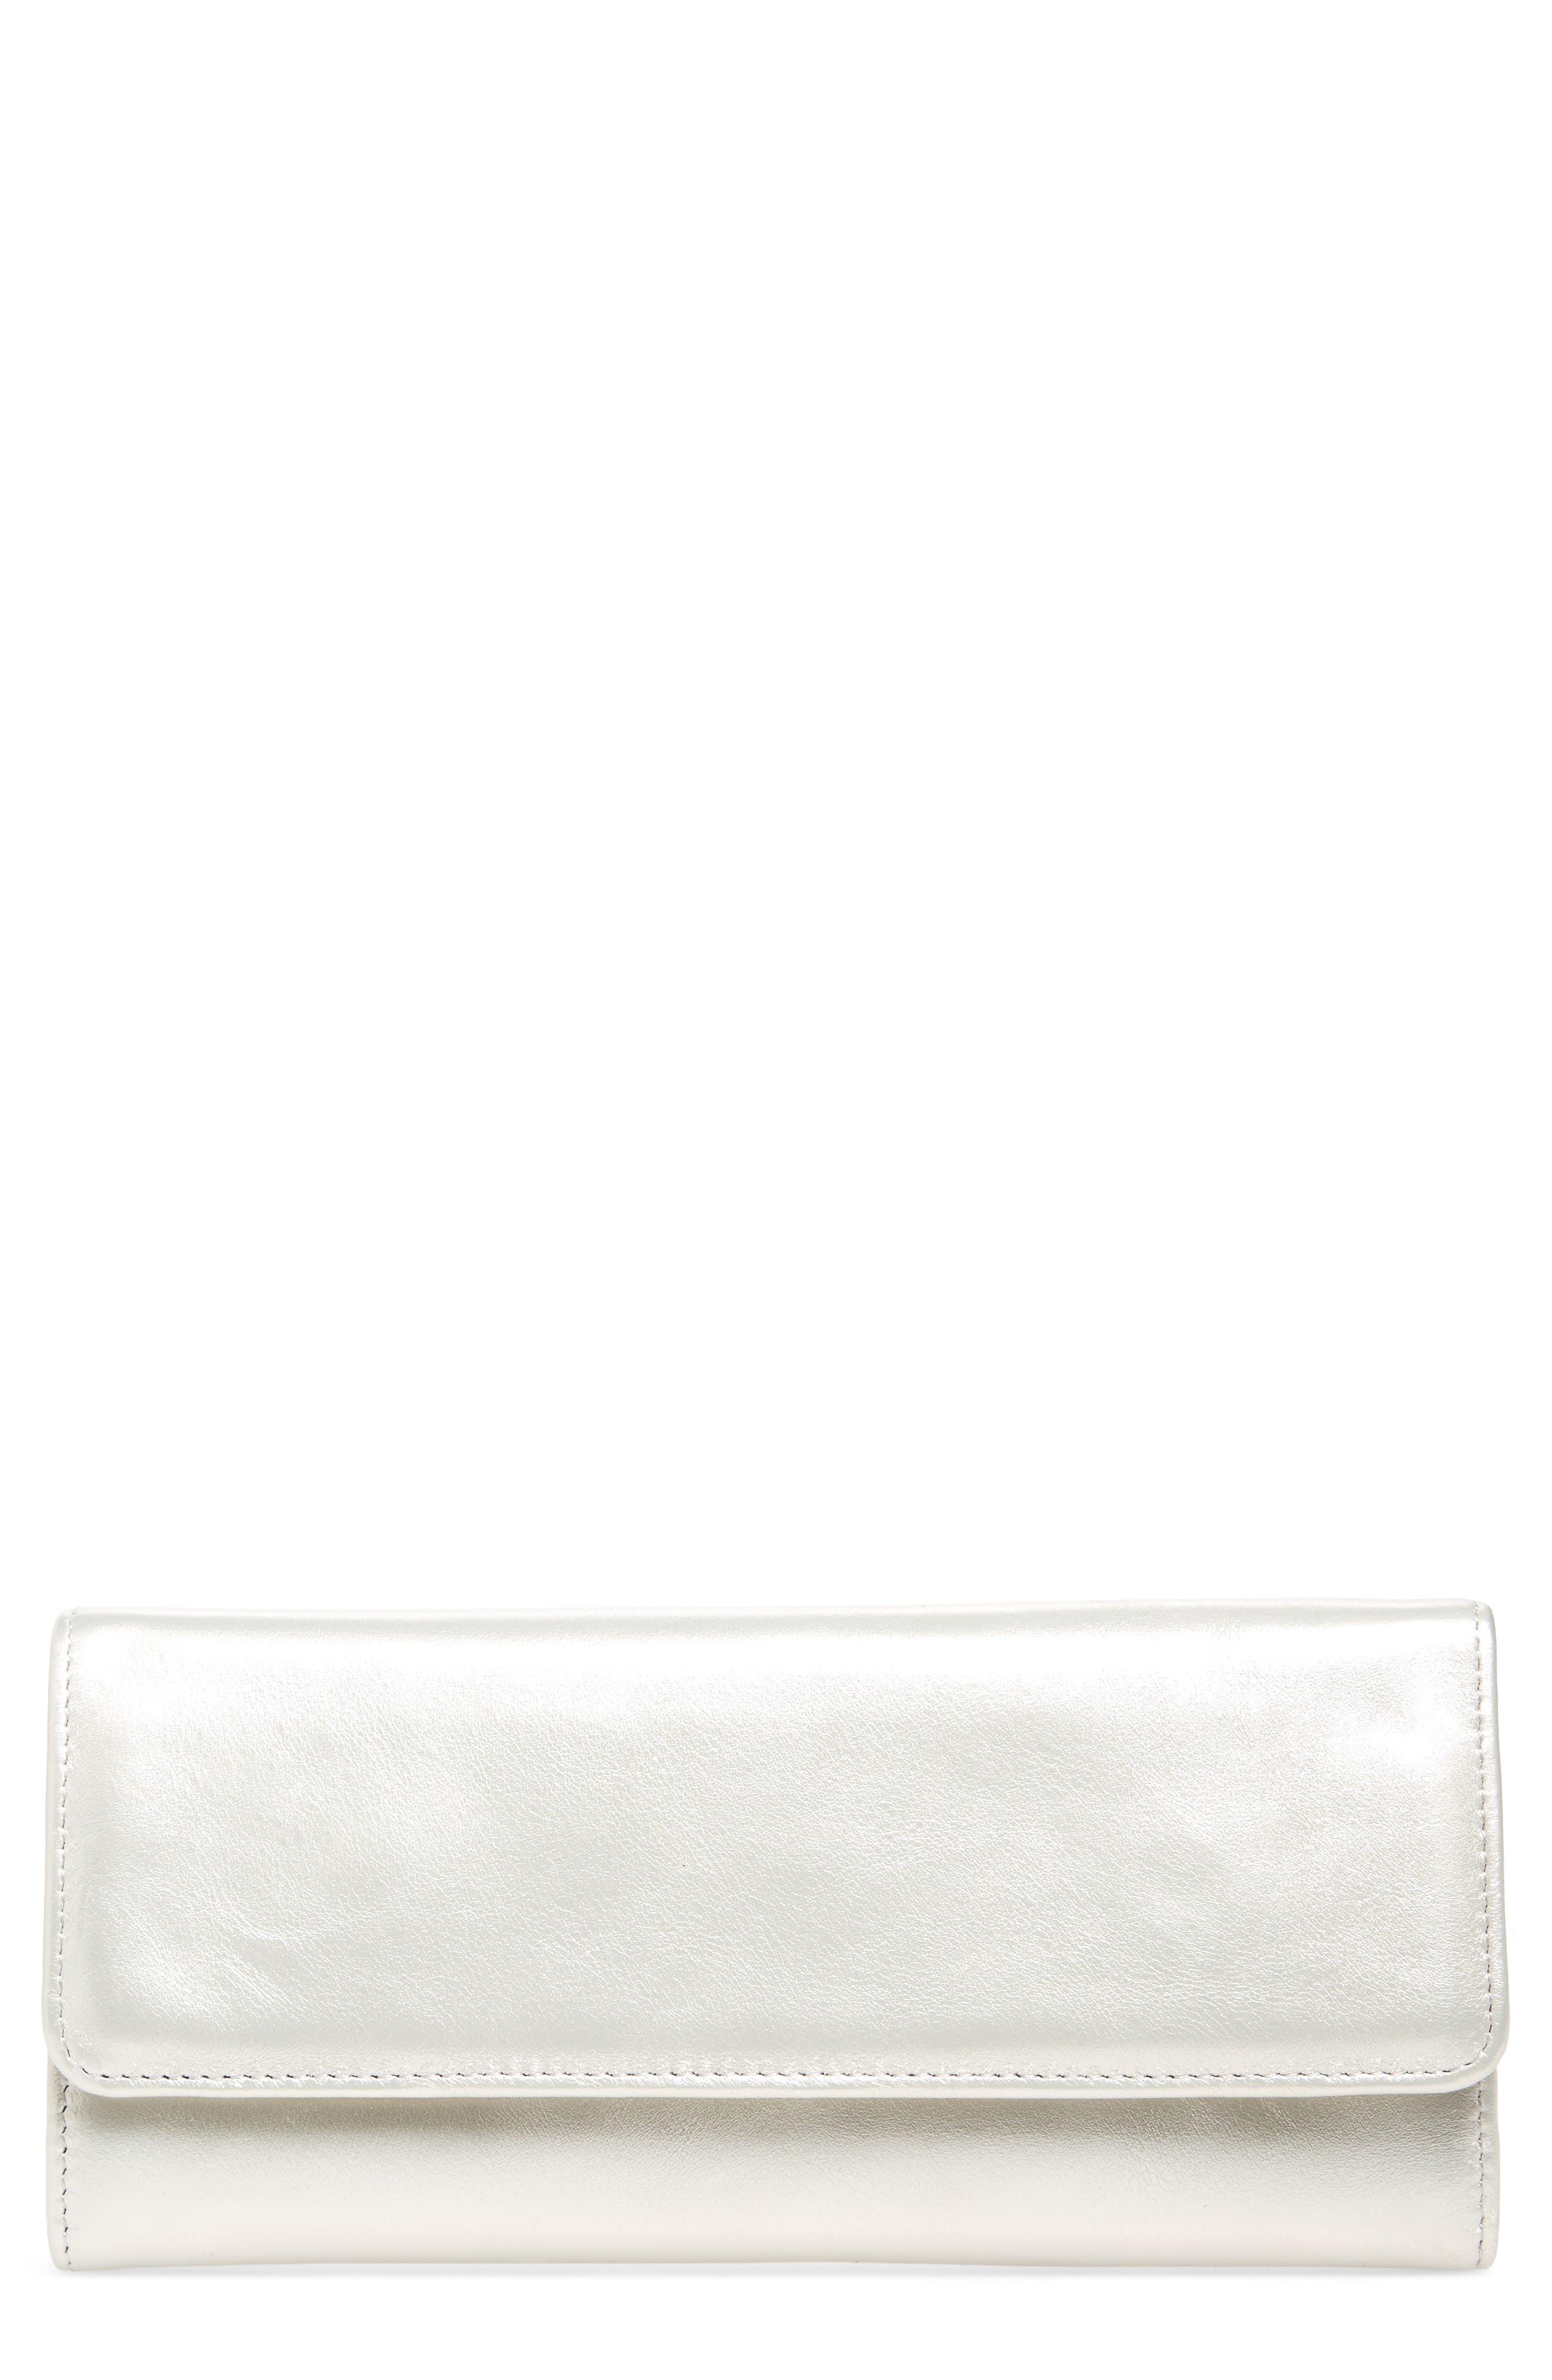 'Sadie' Leather Wallet,                             Main thumbnail 2, color,